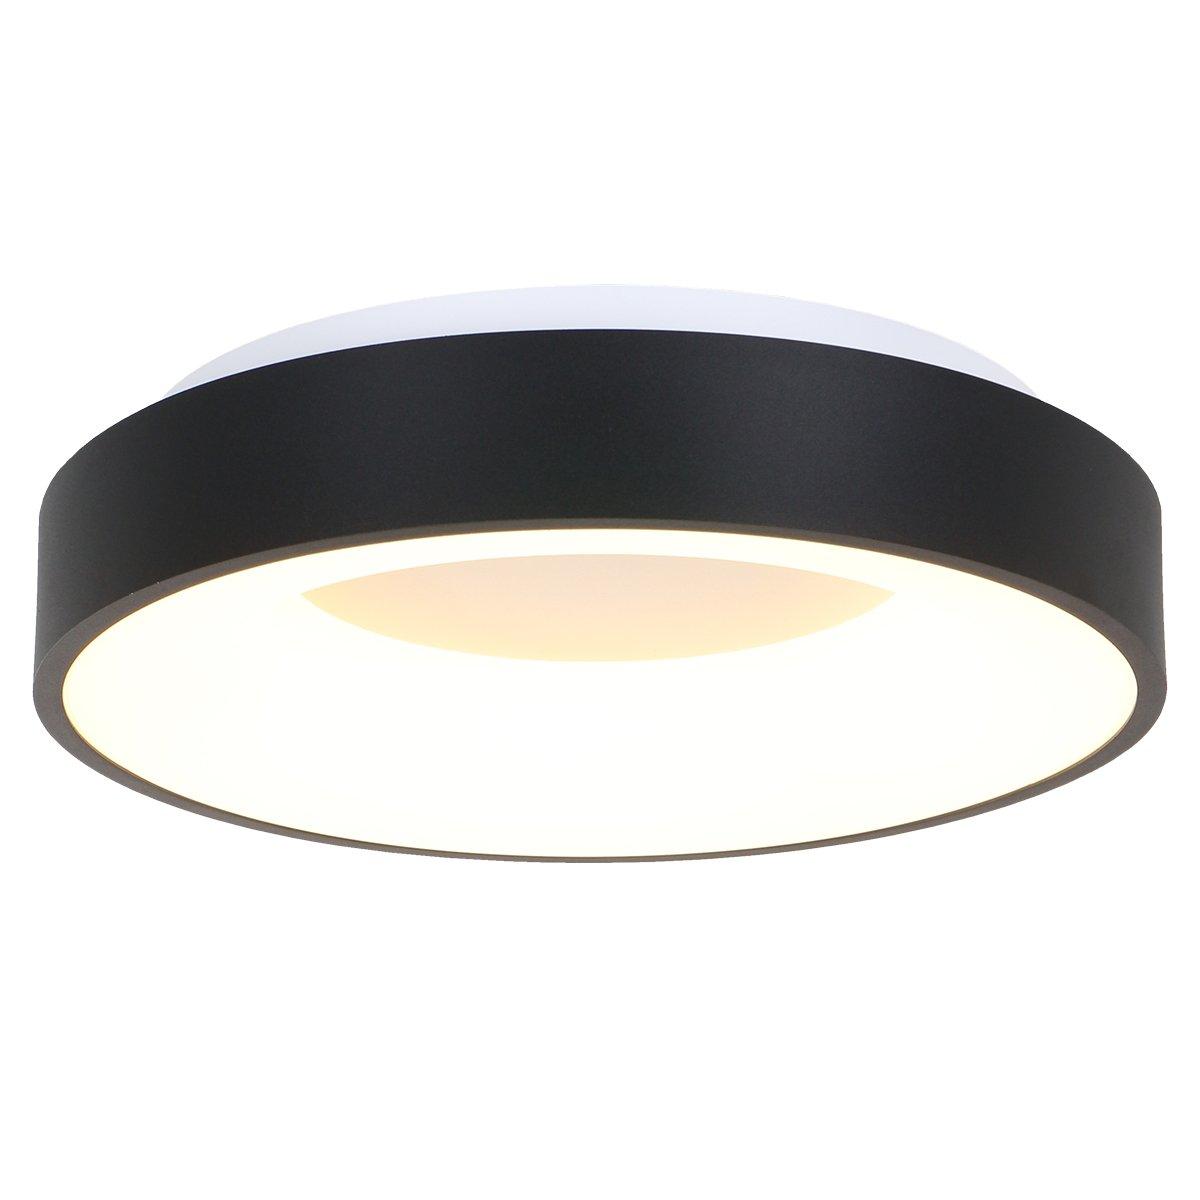 Plafondlamp Steinhauer 2563 Zwart